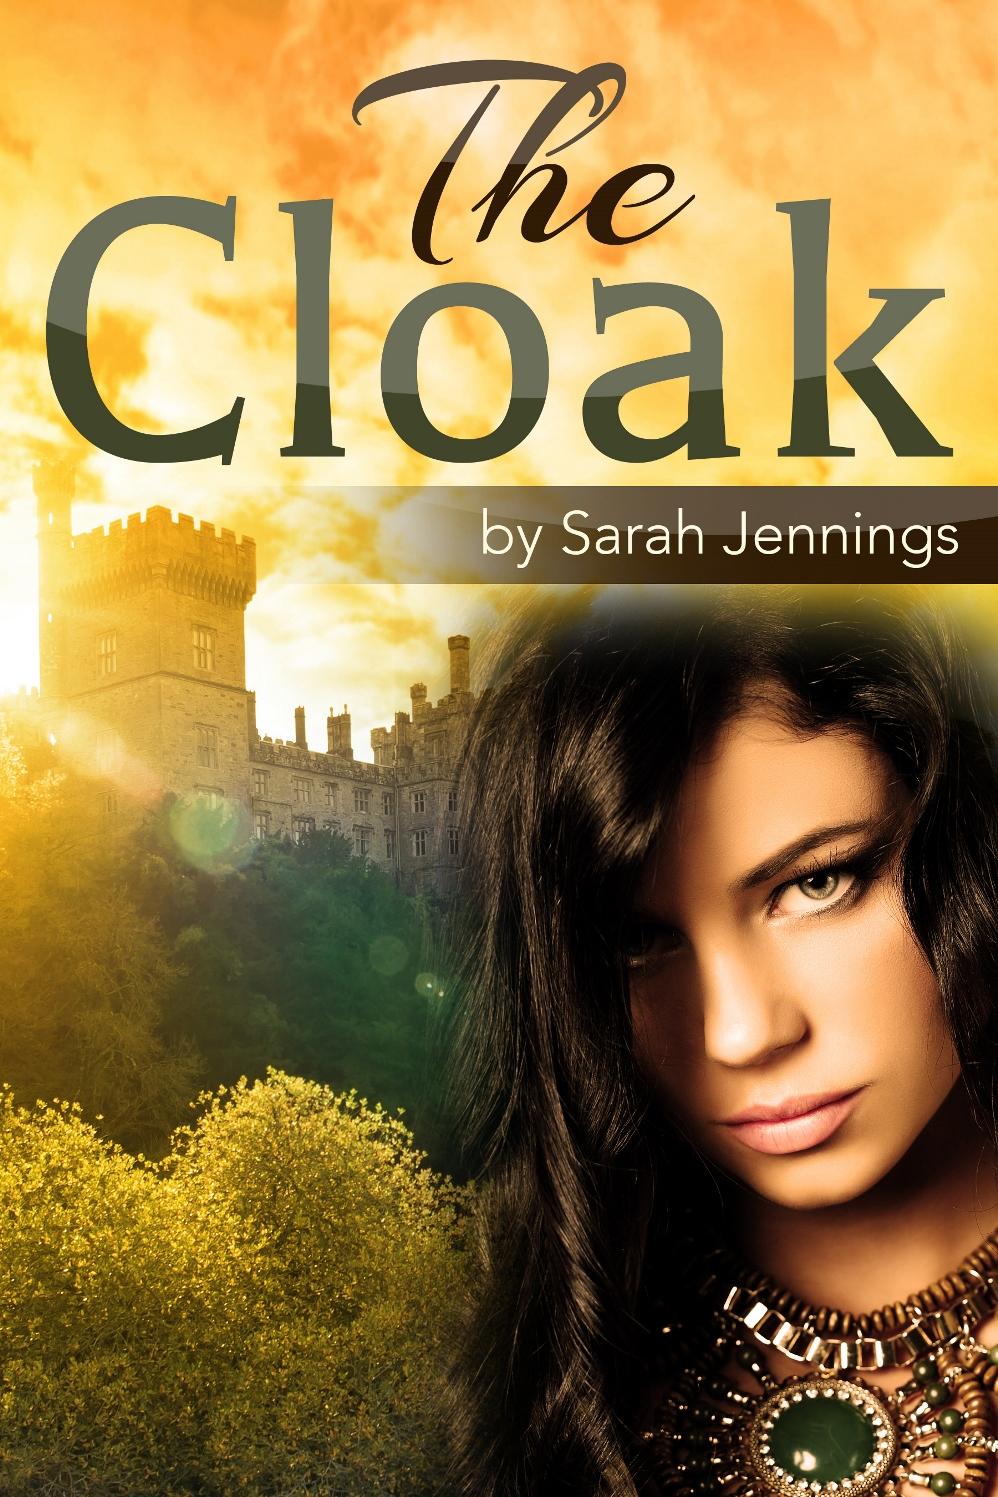 THE CLOAK by Sarah Jennings